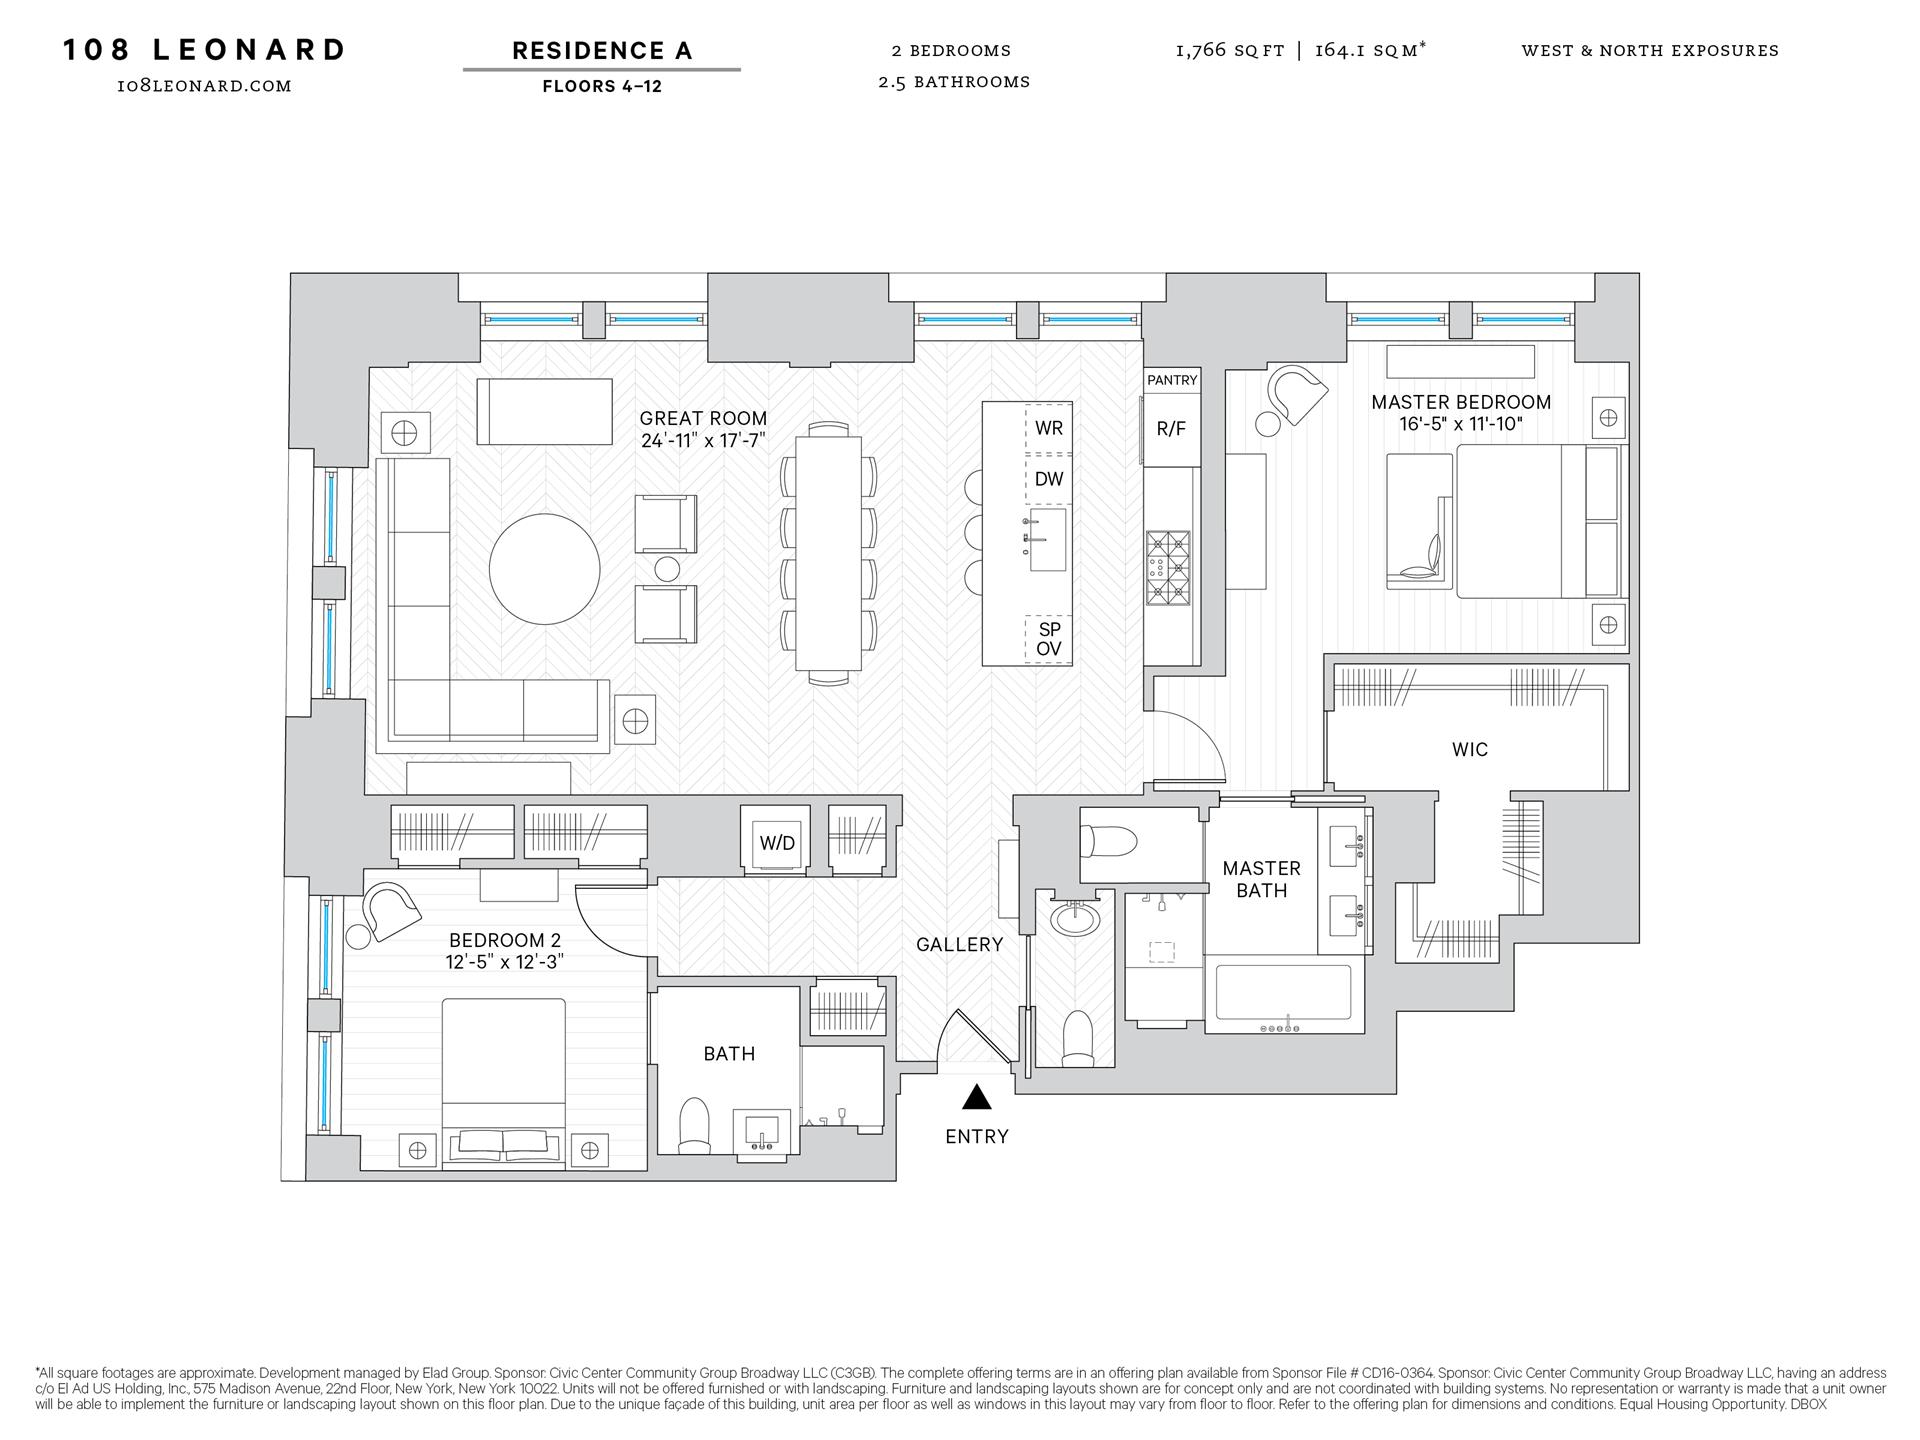 Floor plan of 108 Leonard St, 10A - TriBeCa, New York